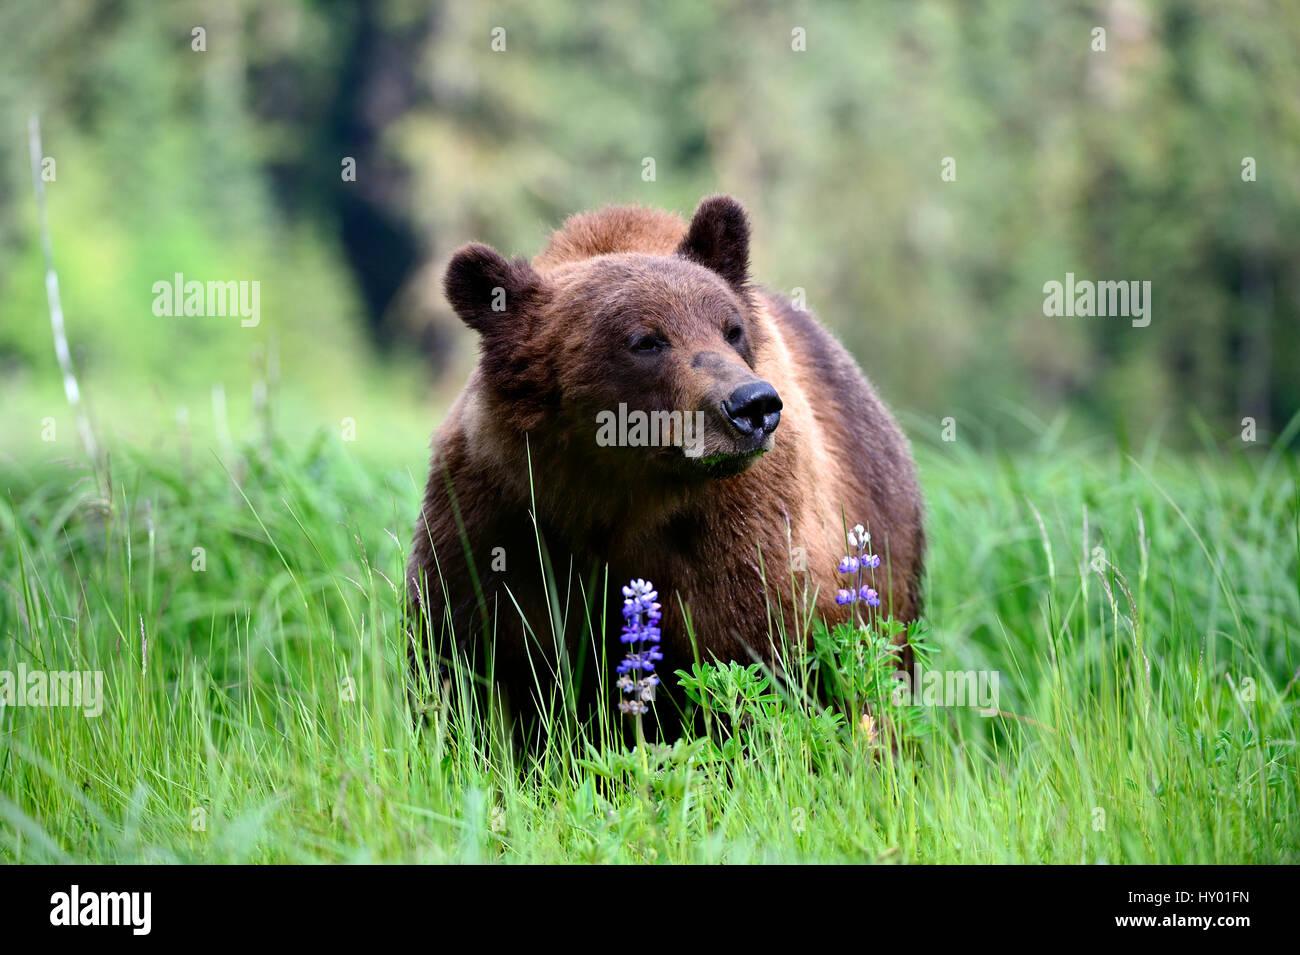 Male Grizzly bear (Ursus arctos horribilis) feeding on Nootka lupine. Khutzeymateen Grizzly Bear Sanctuary, British - Stock Image